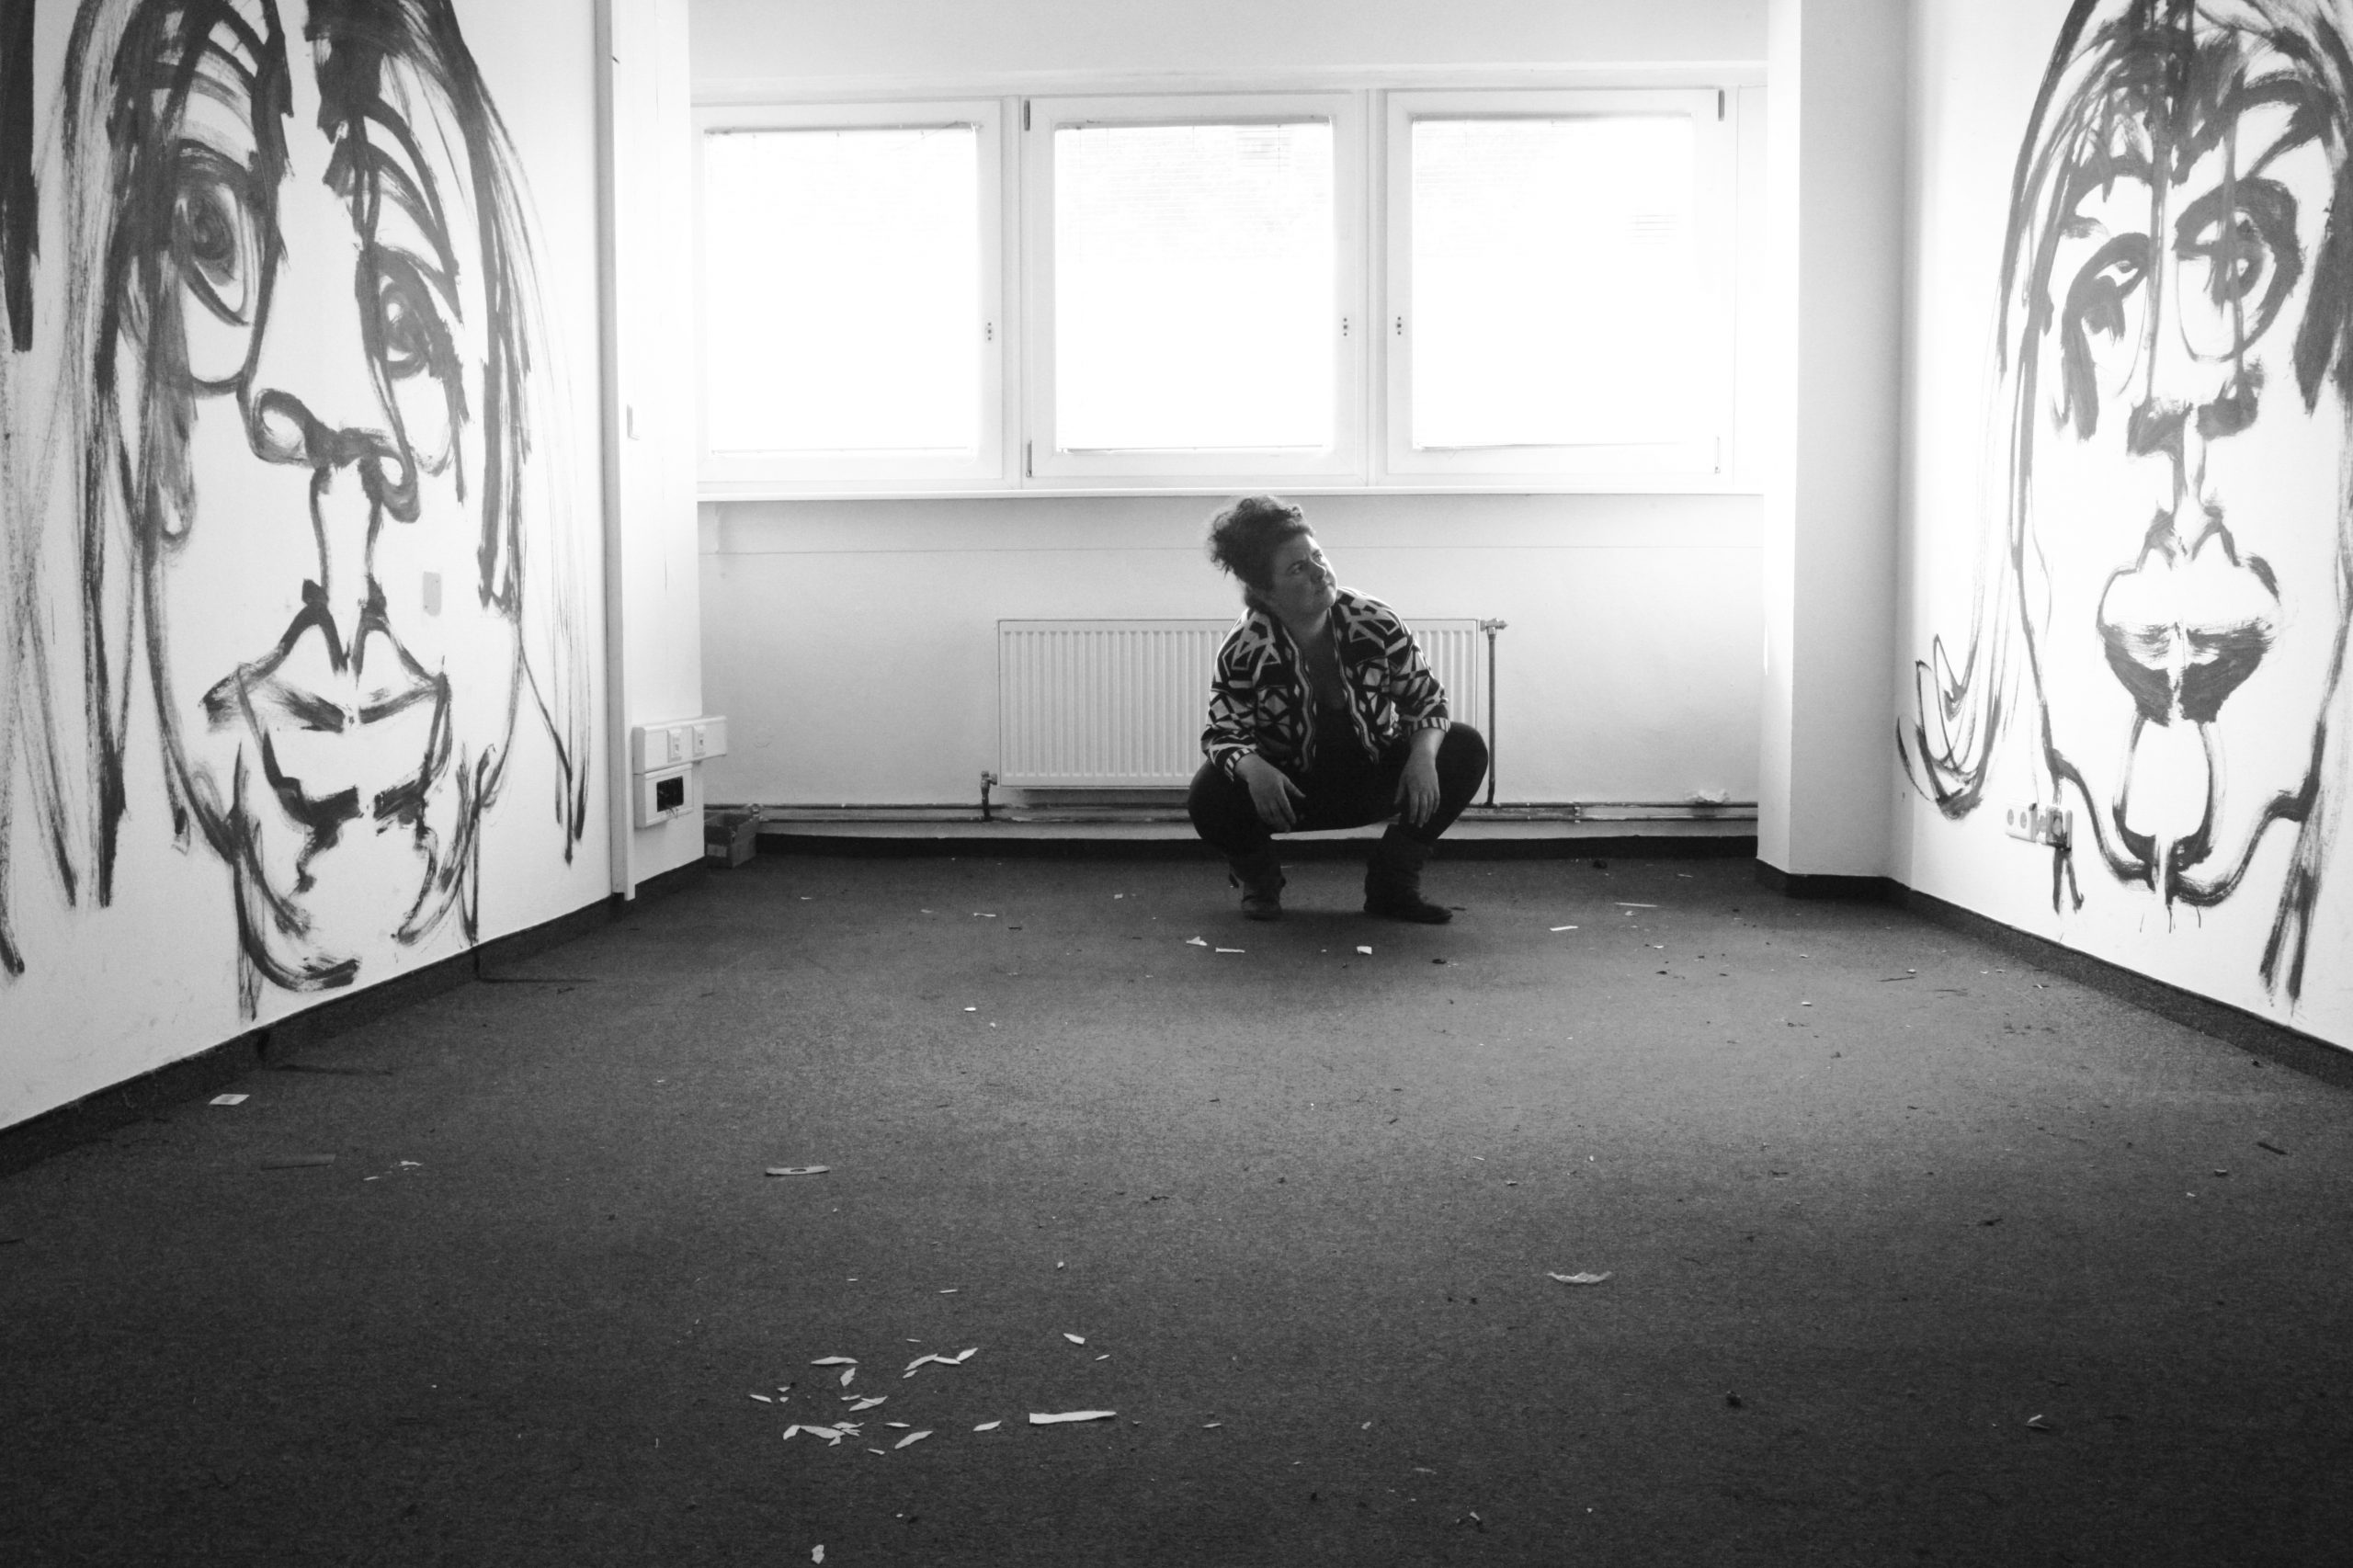 eine Person hockt in einem Raum, rechts und links neben ihr an der Wand sind überlebensgroße Portraits gezeichnet | a person squats in a room, to the right and left of him on the wall are drawn larger-than-life portraits